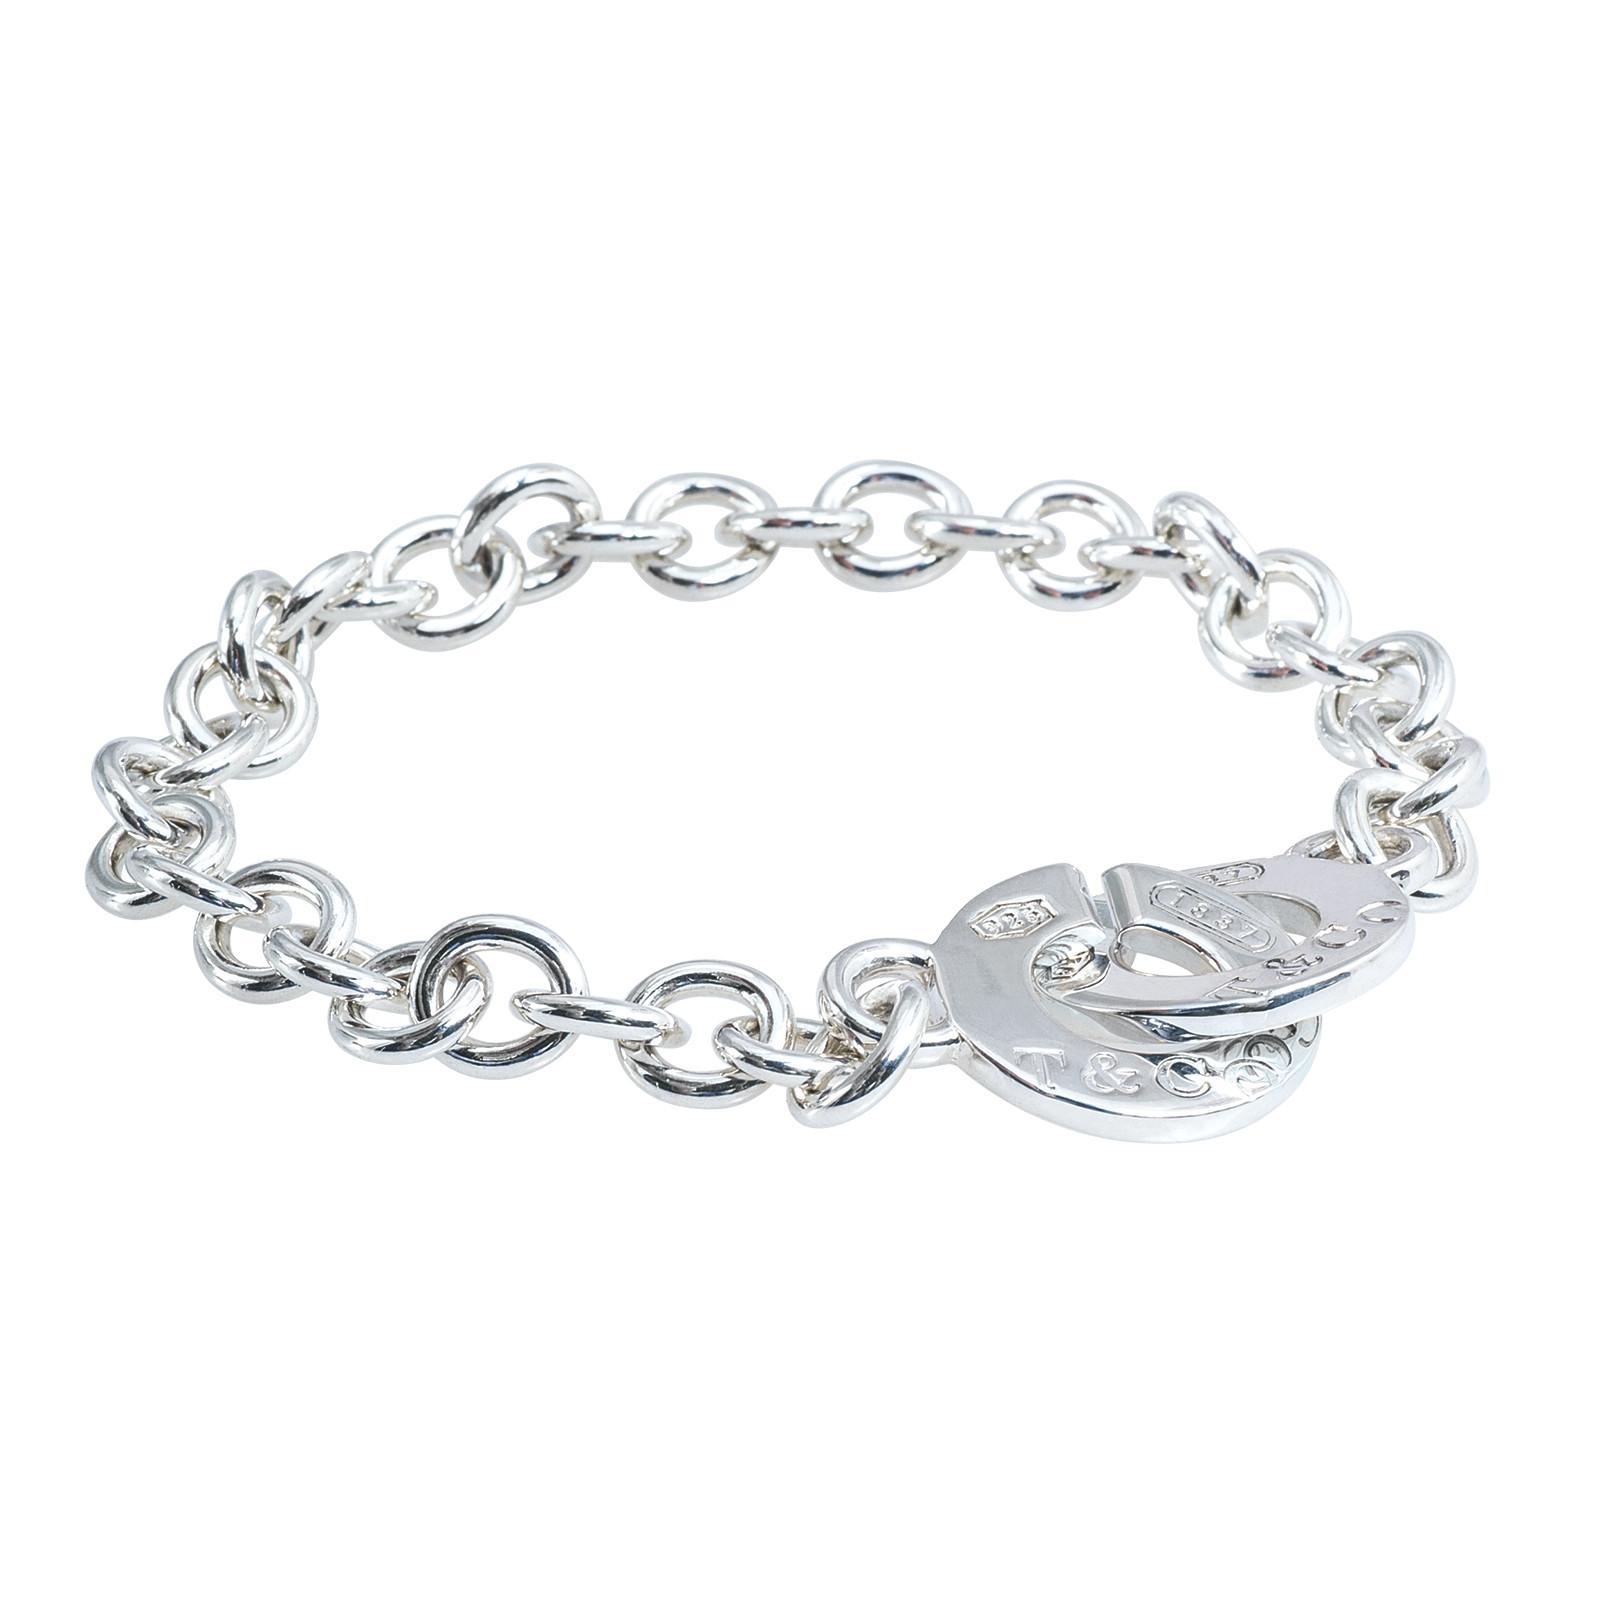 Vintage Tiffany & Co. 1837 Interlocking Circle Link Bracelet